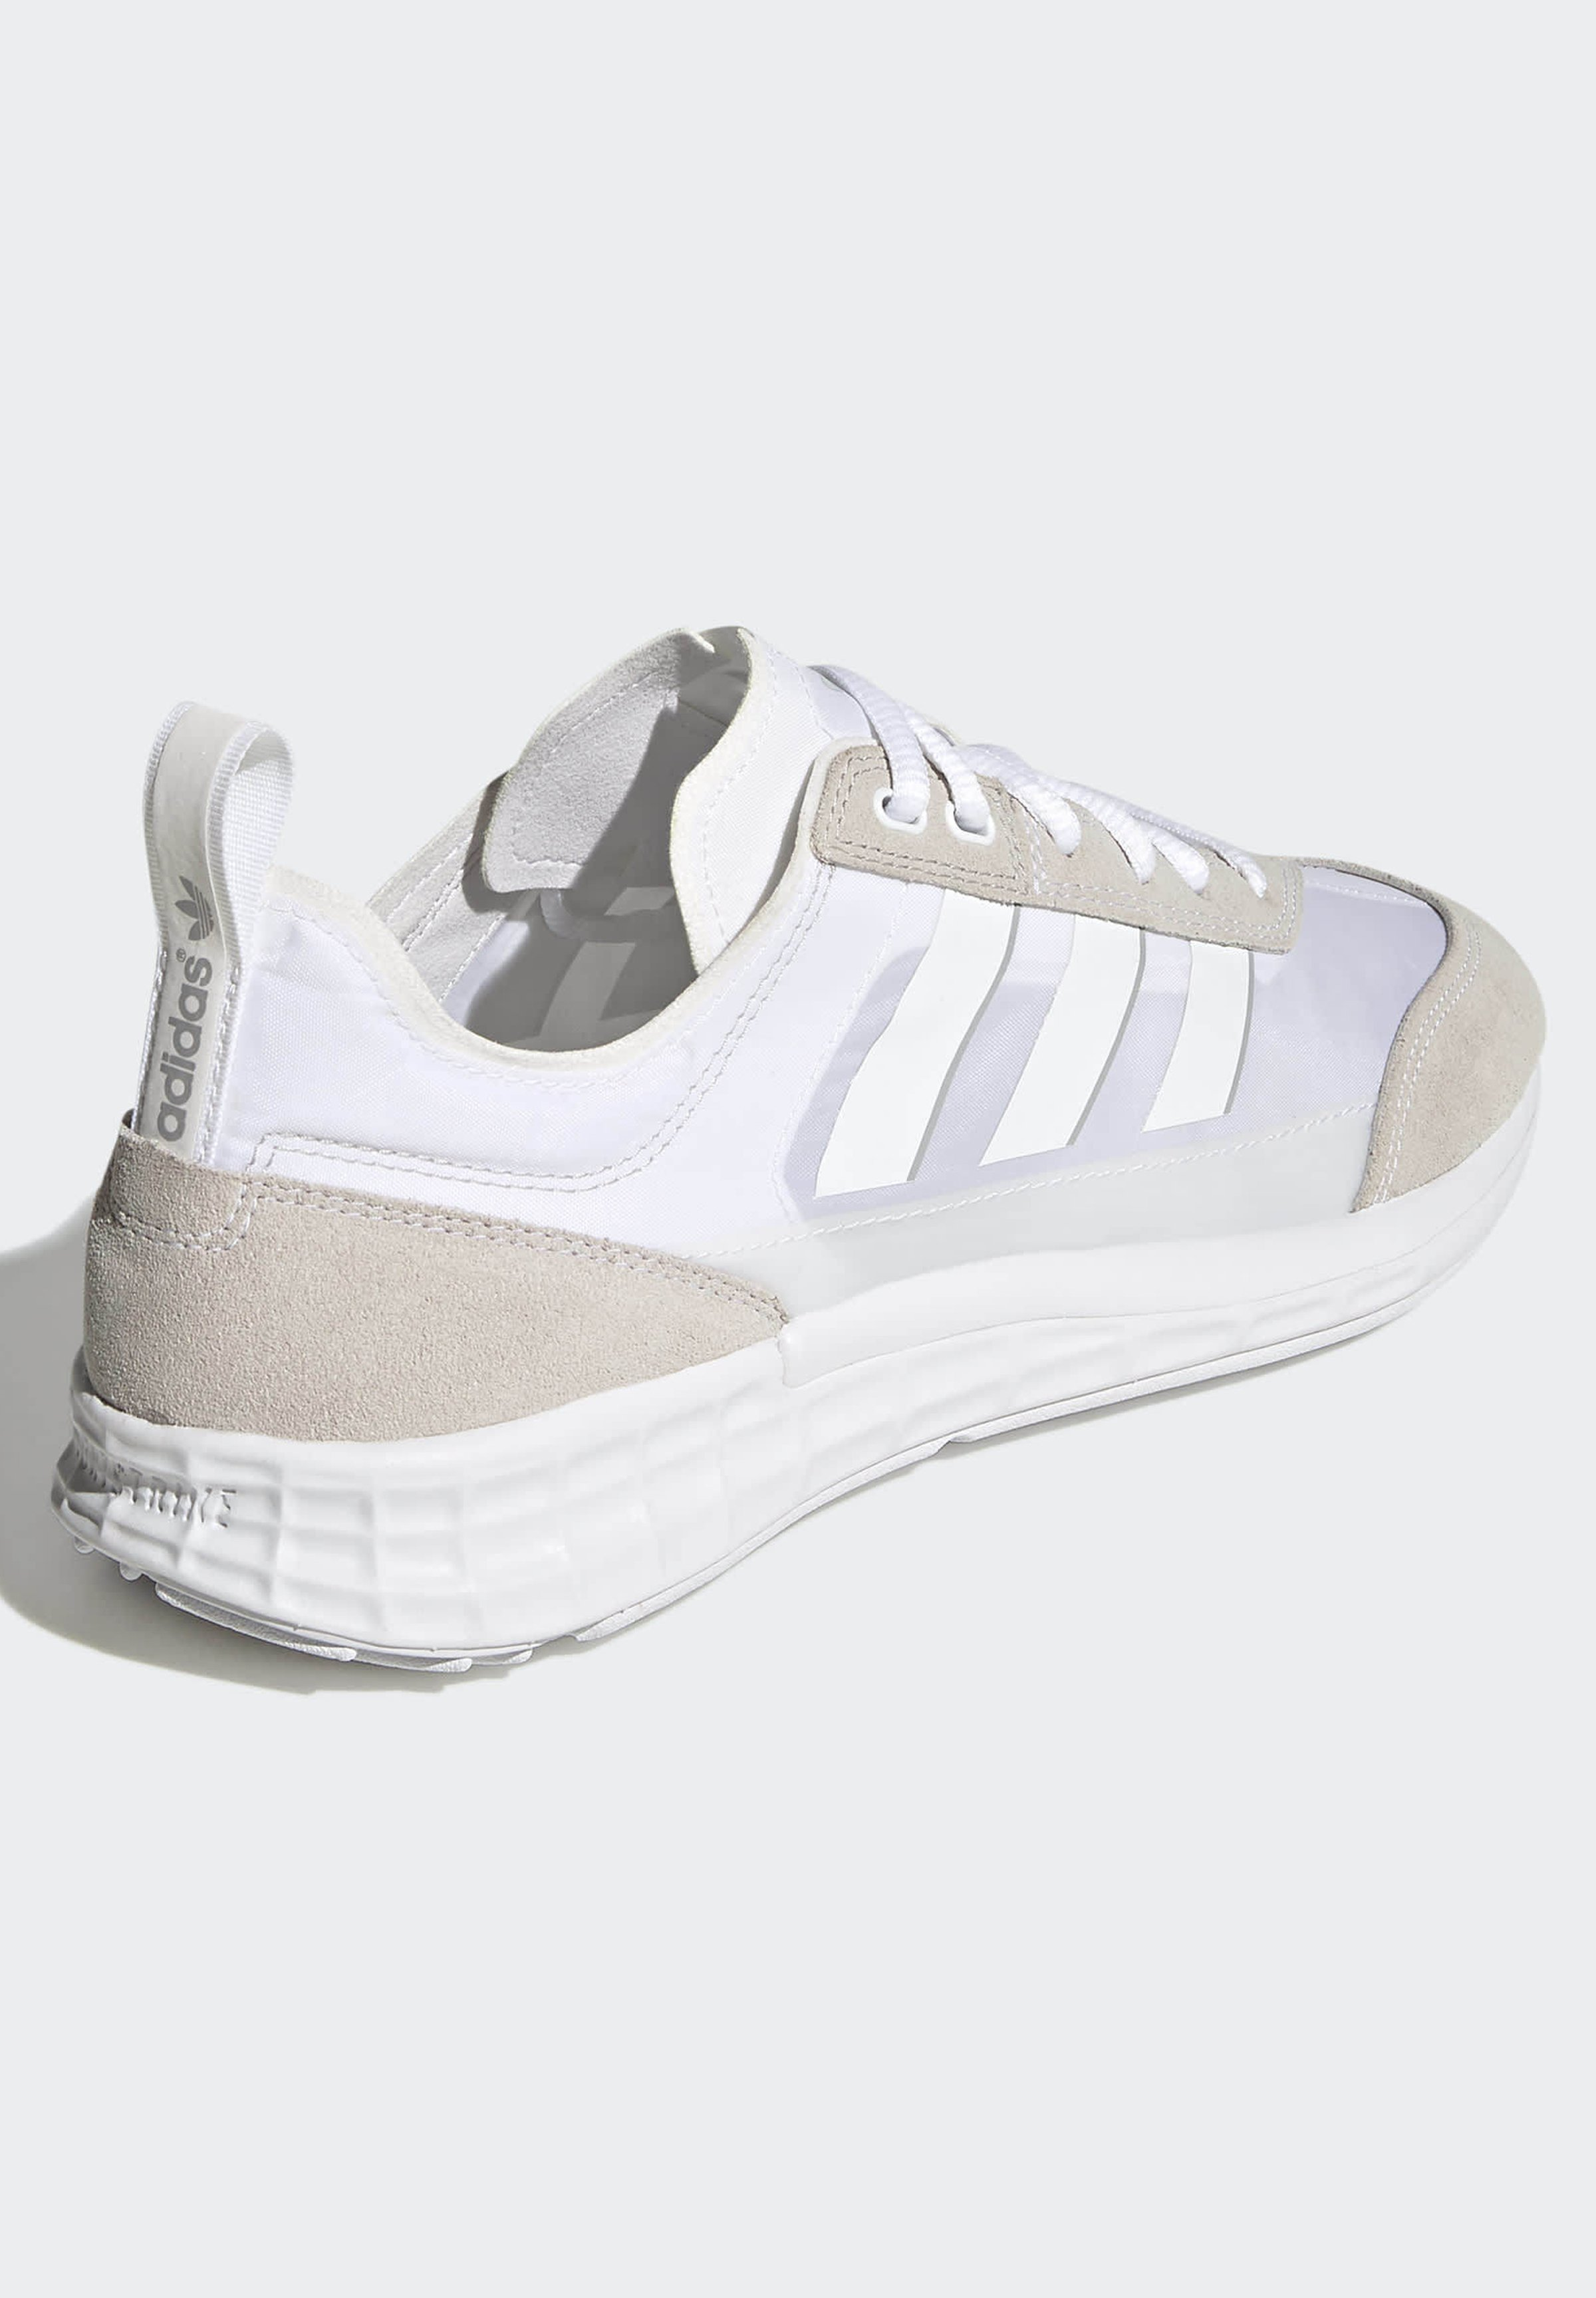 adidas Originals SL 7200 SHOES - Sneaker low - white/weiß - Herrenschuhe a7DcN